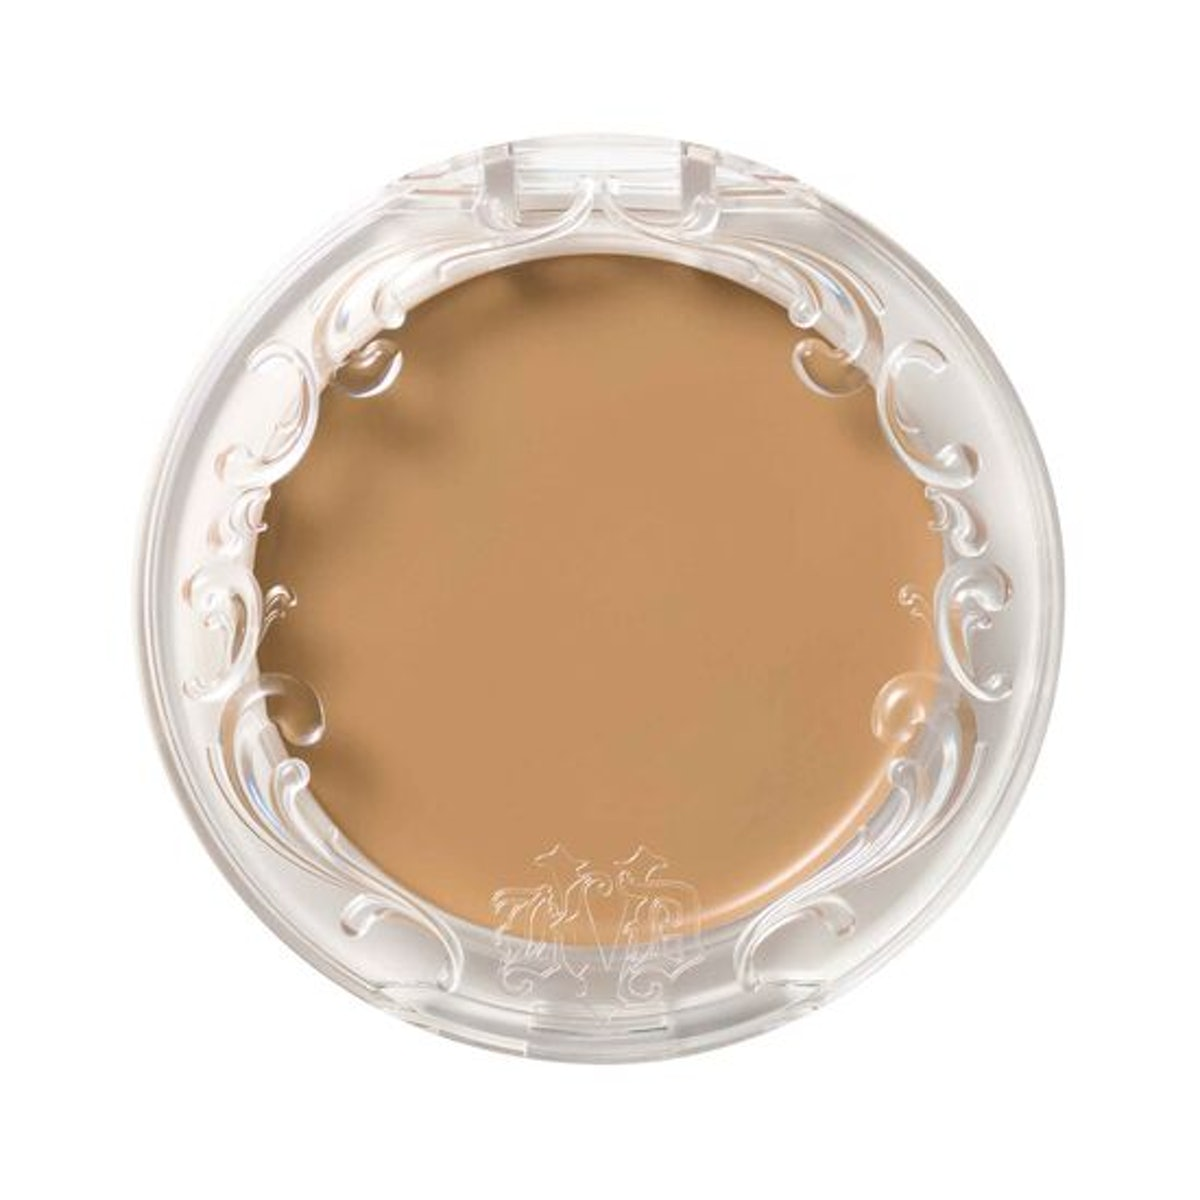 Good Apple Skin-Perfecting Foundation Balm